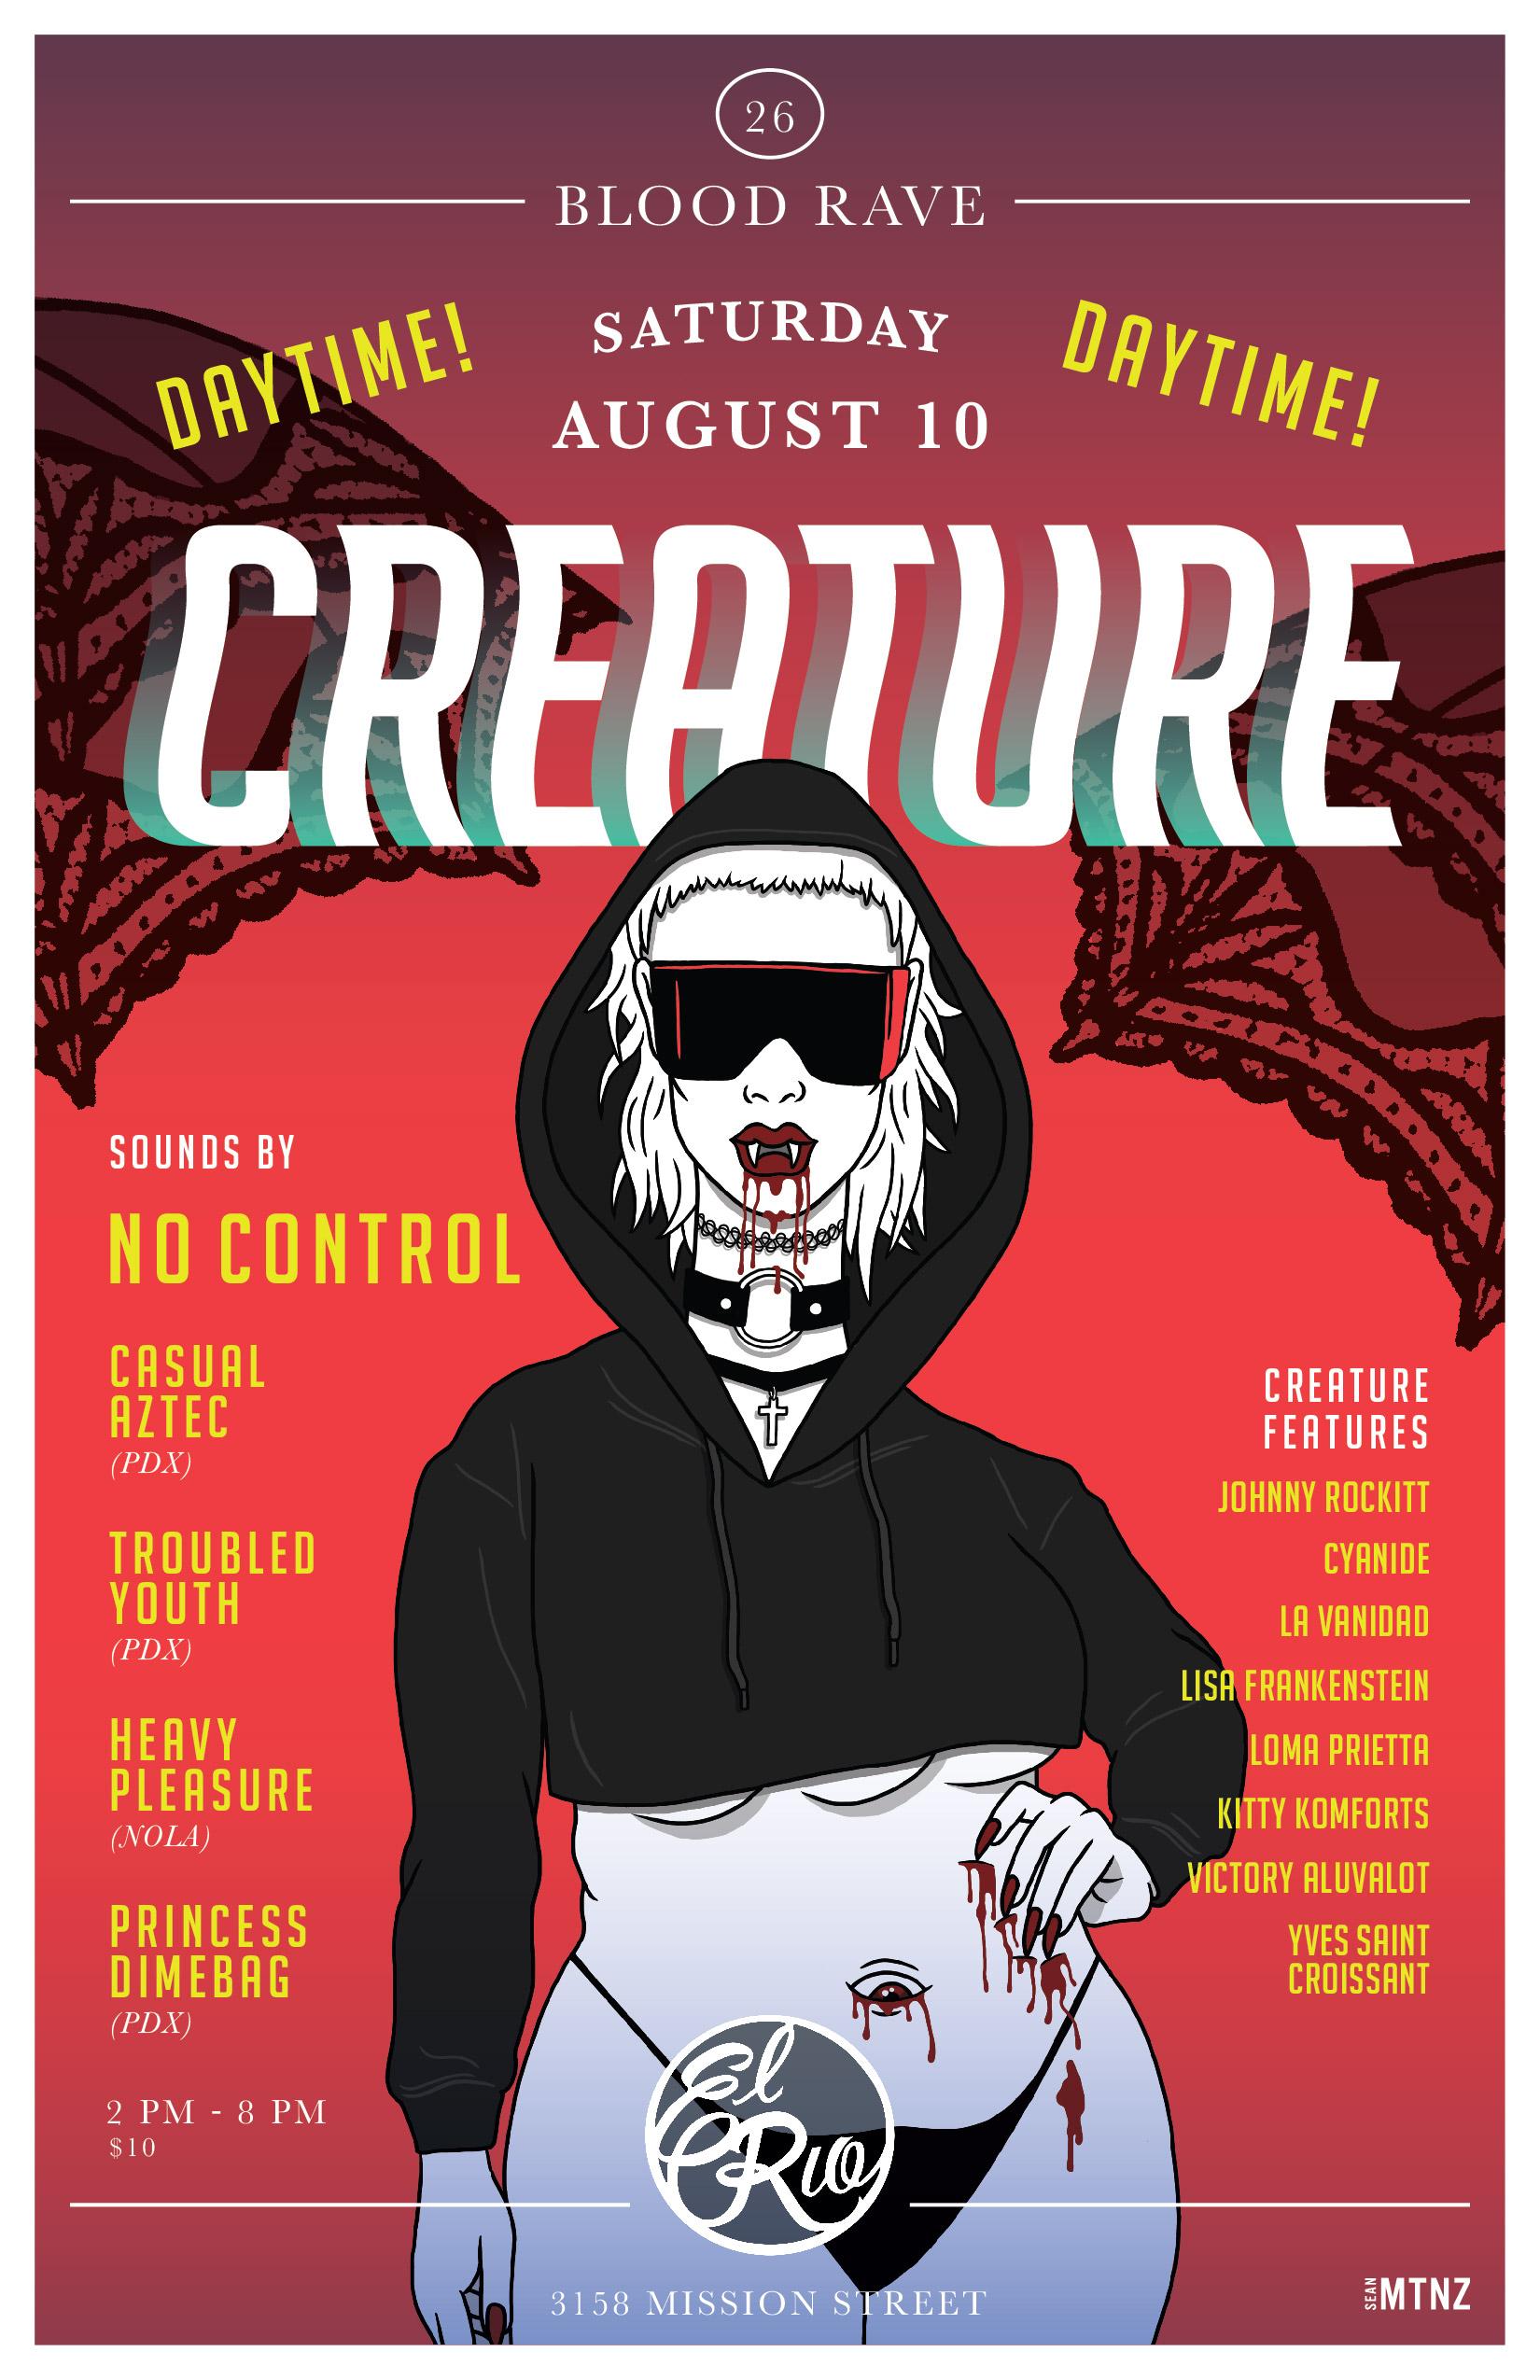 Creature: Blood Rave